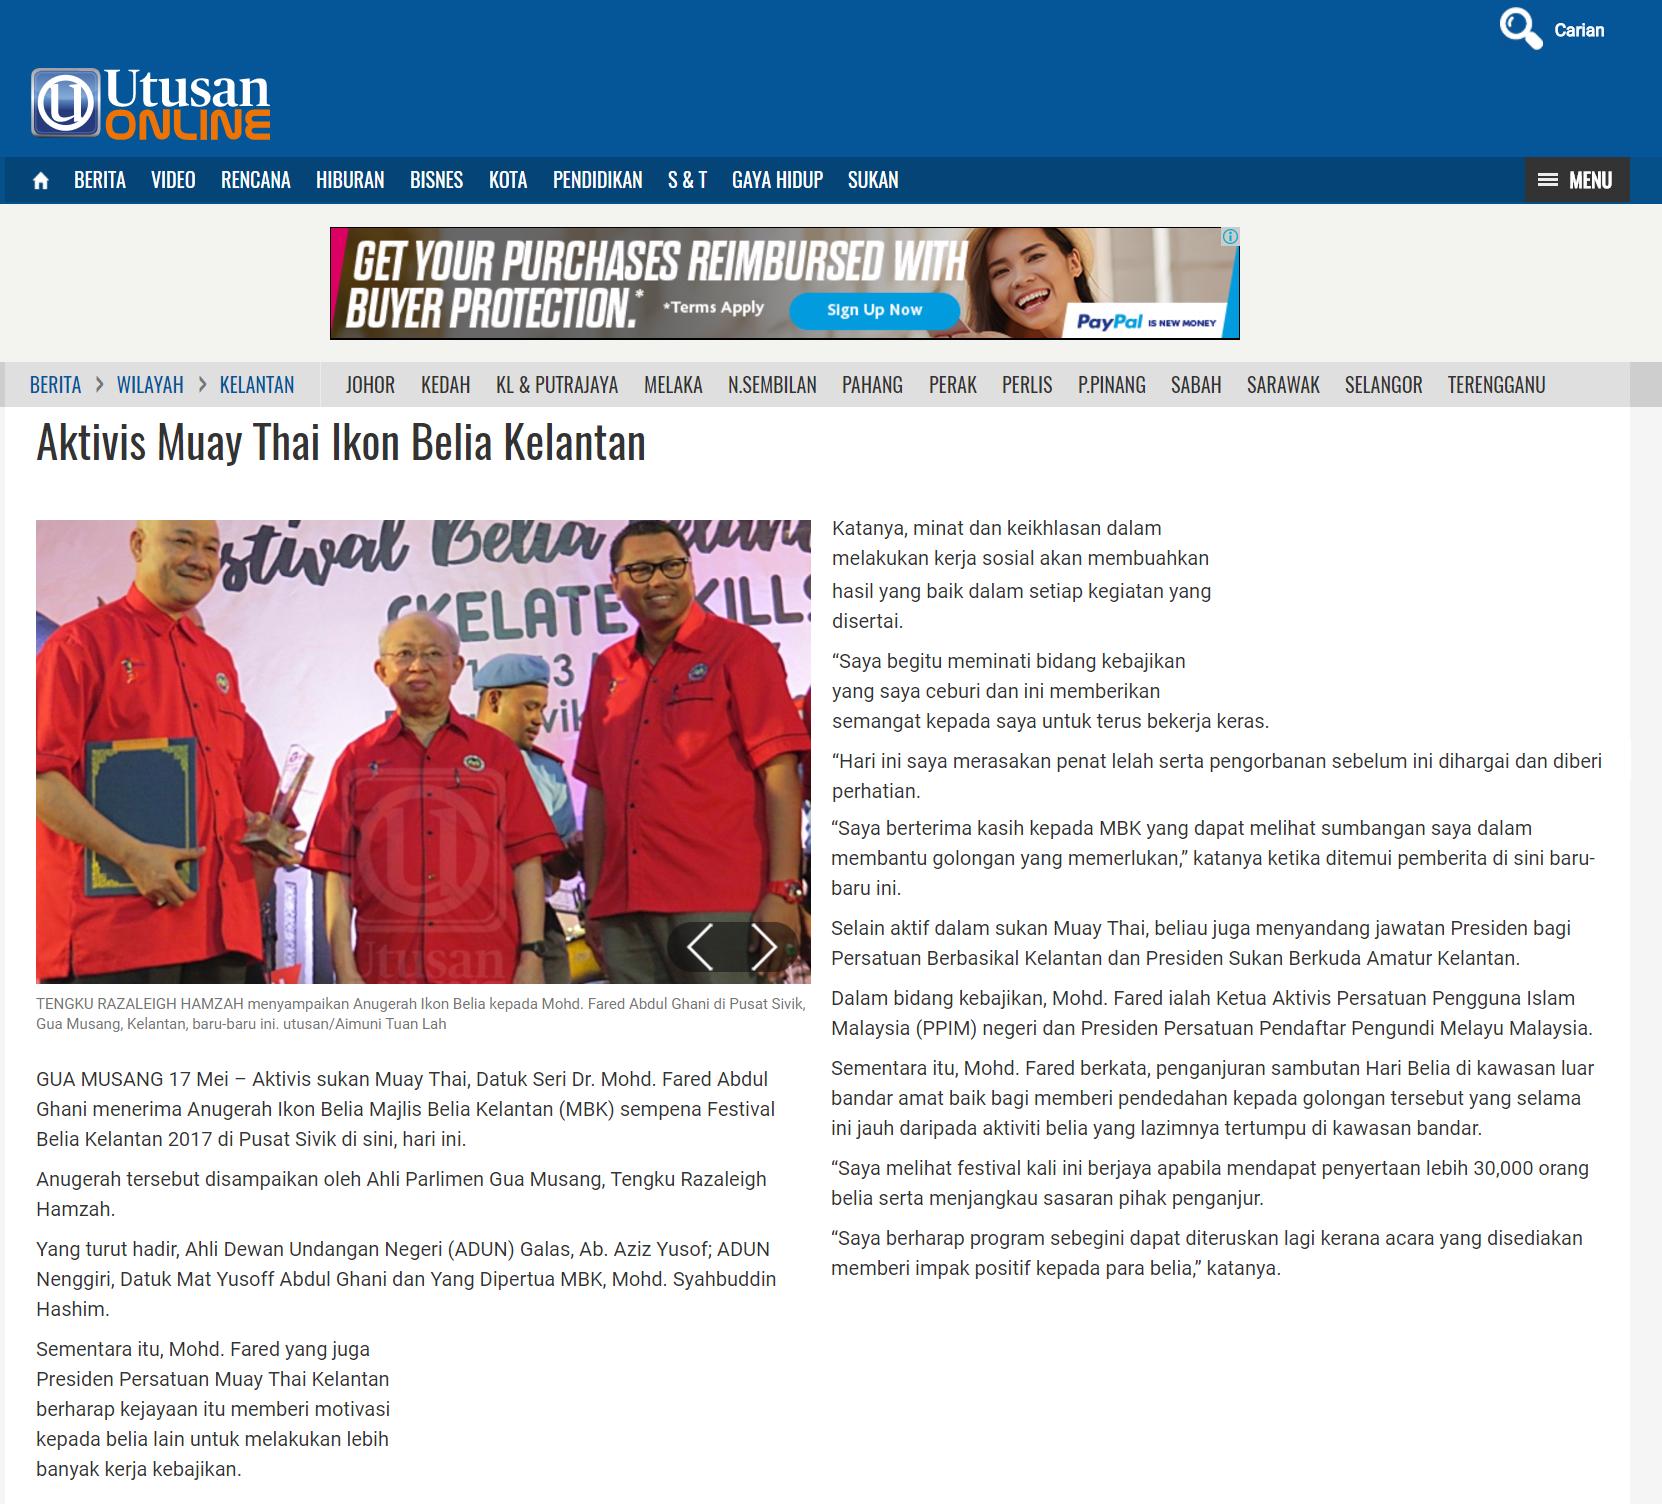 20170518 - Utusan Online - Aktivis Muay Thai Ikon Belia Kelantan